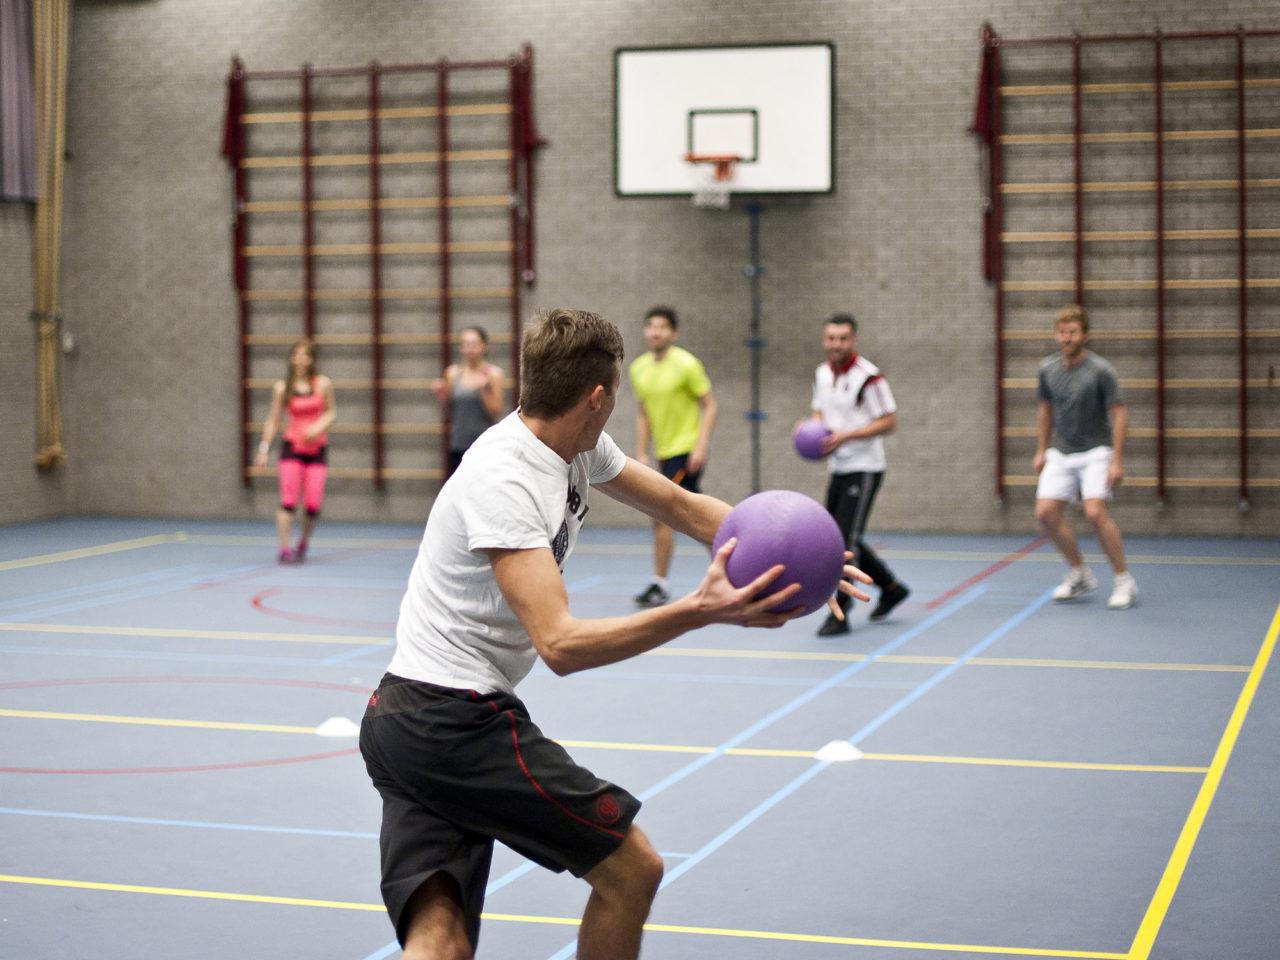 dodgeball-erasmus-sport-1280x960